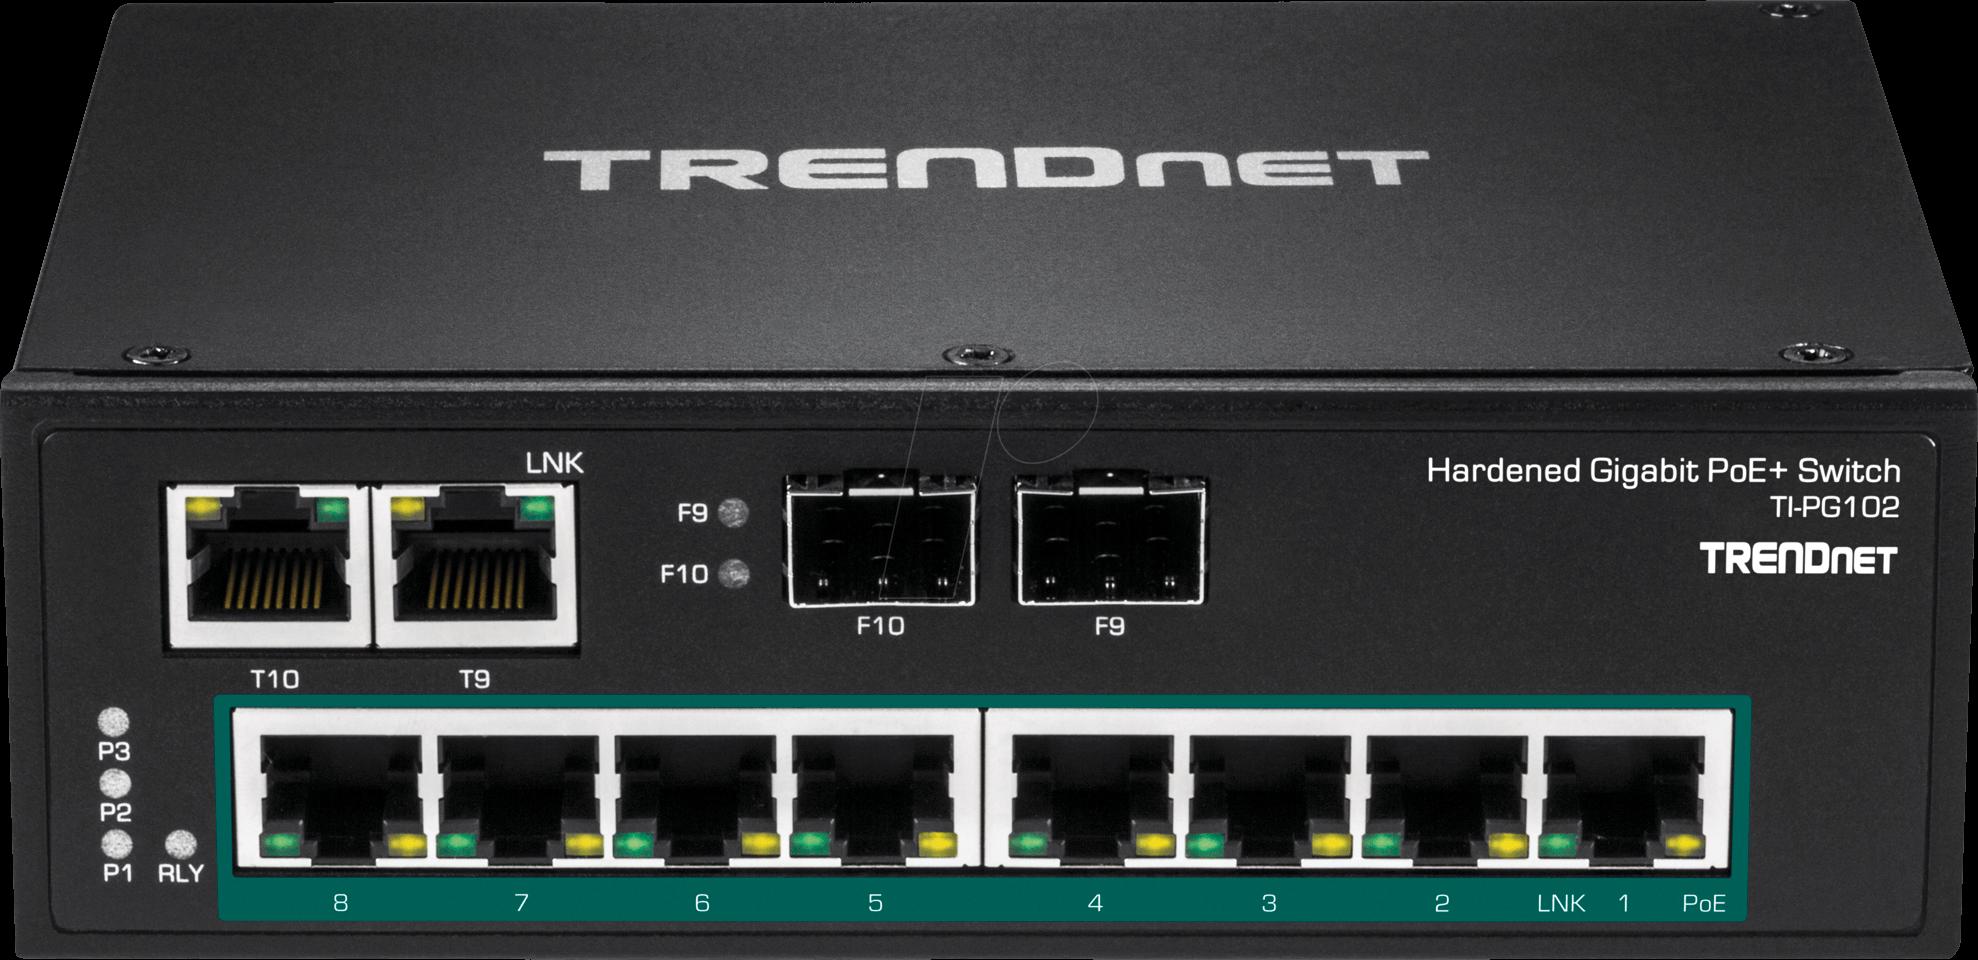 Trn Ti Pg102 Switch 10 Port Gigabit Ethernet Din Rail Poe Bei Trendnet